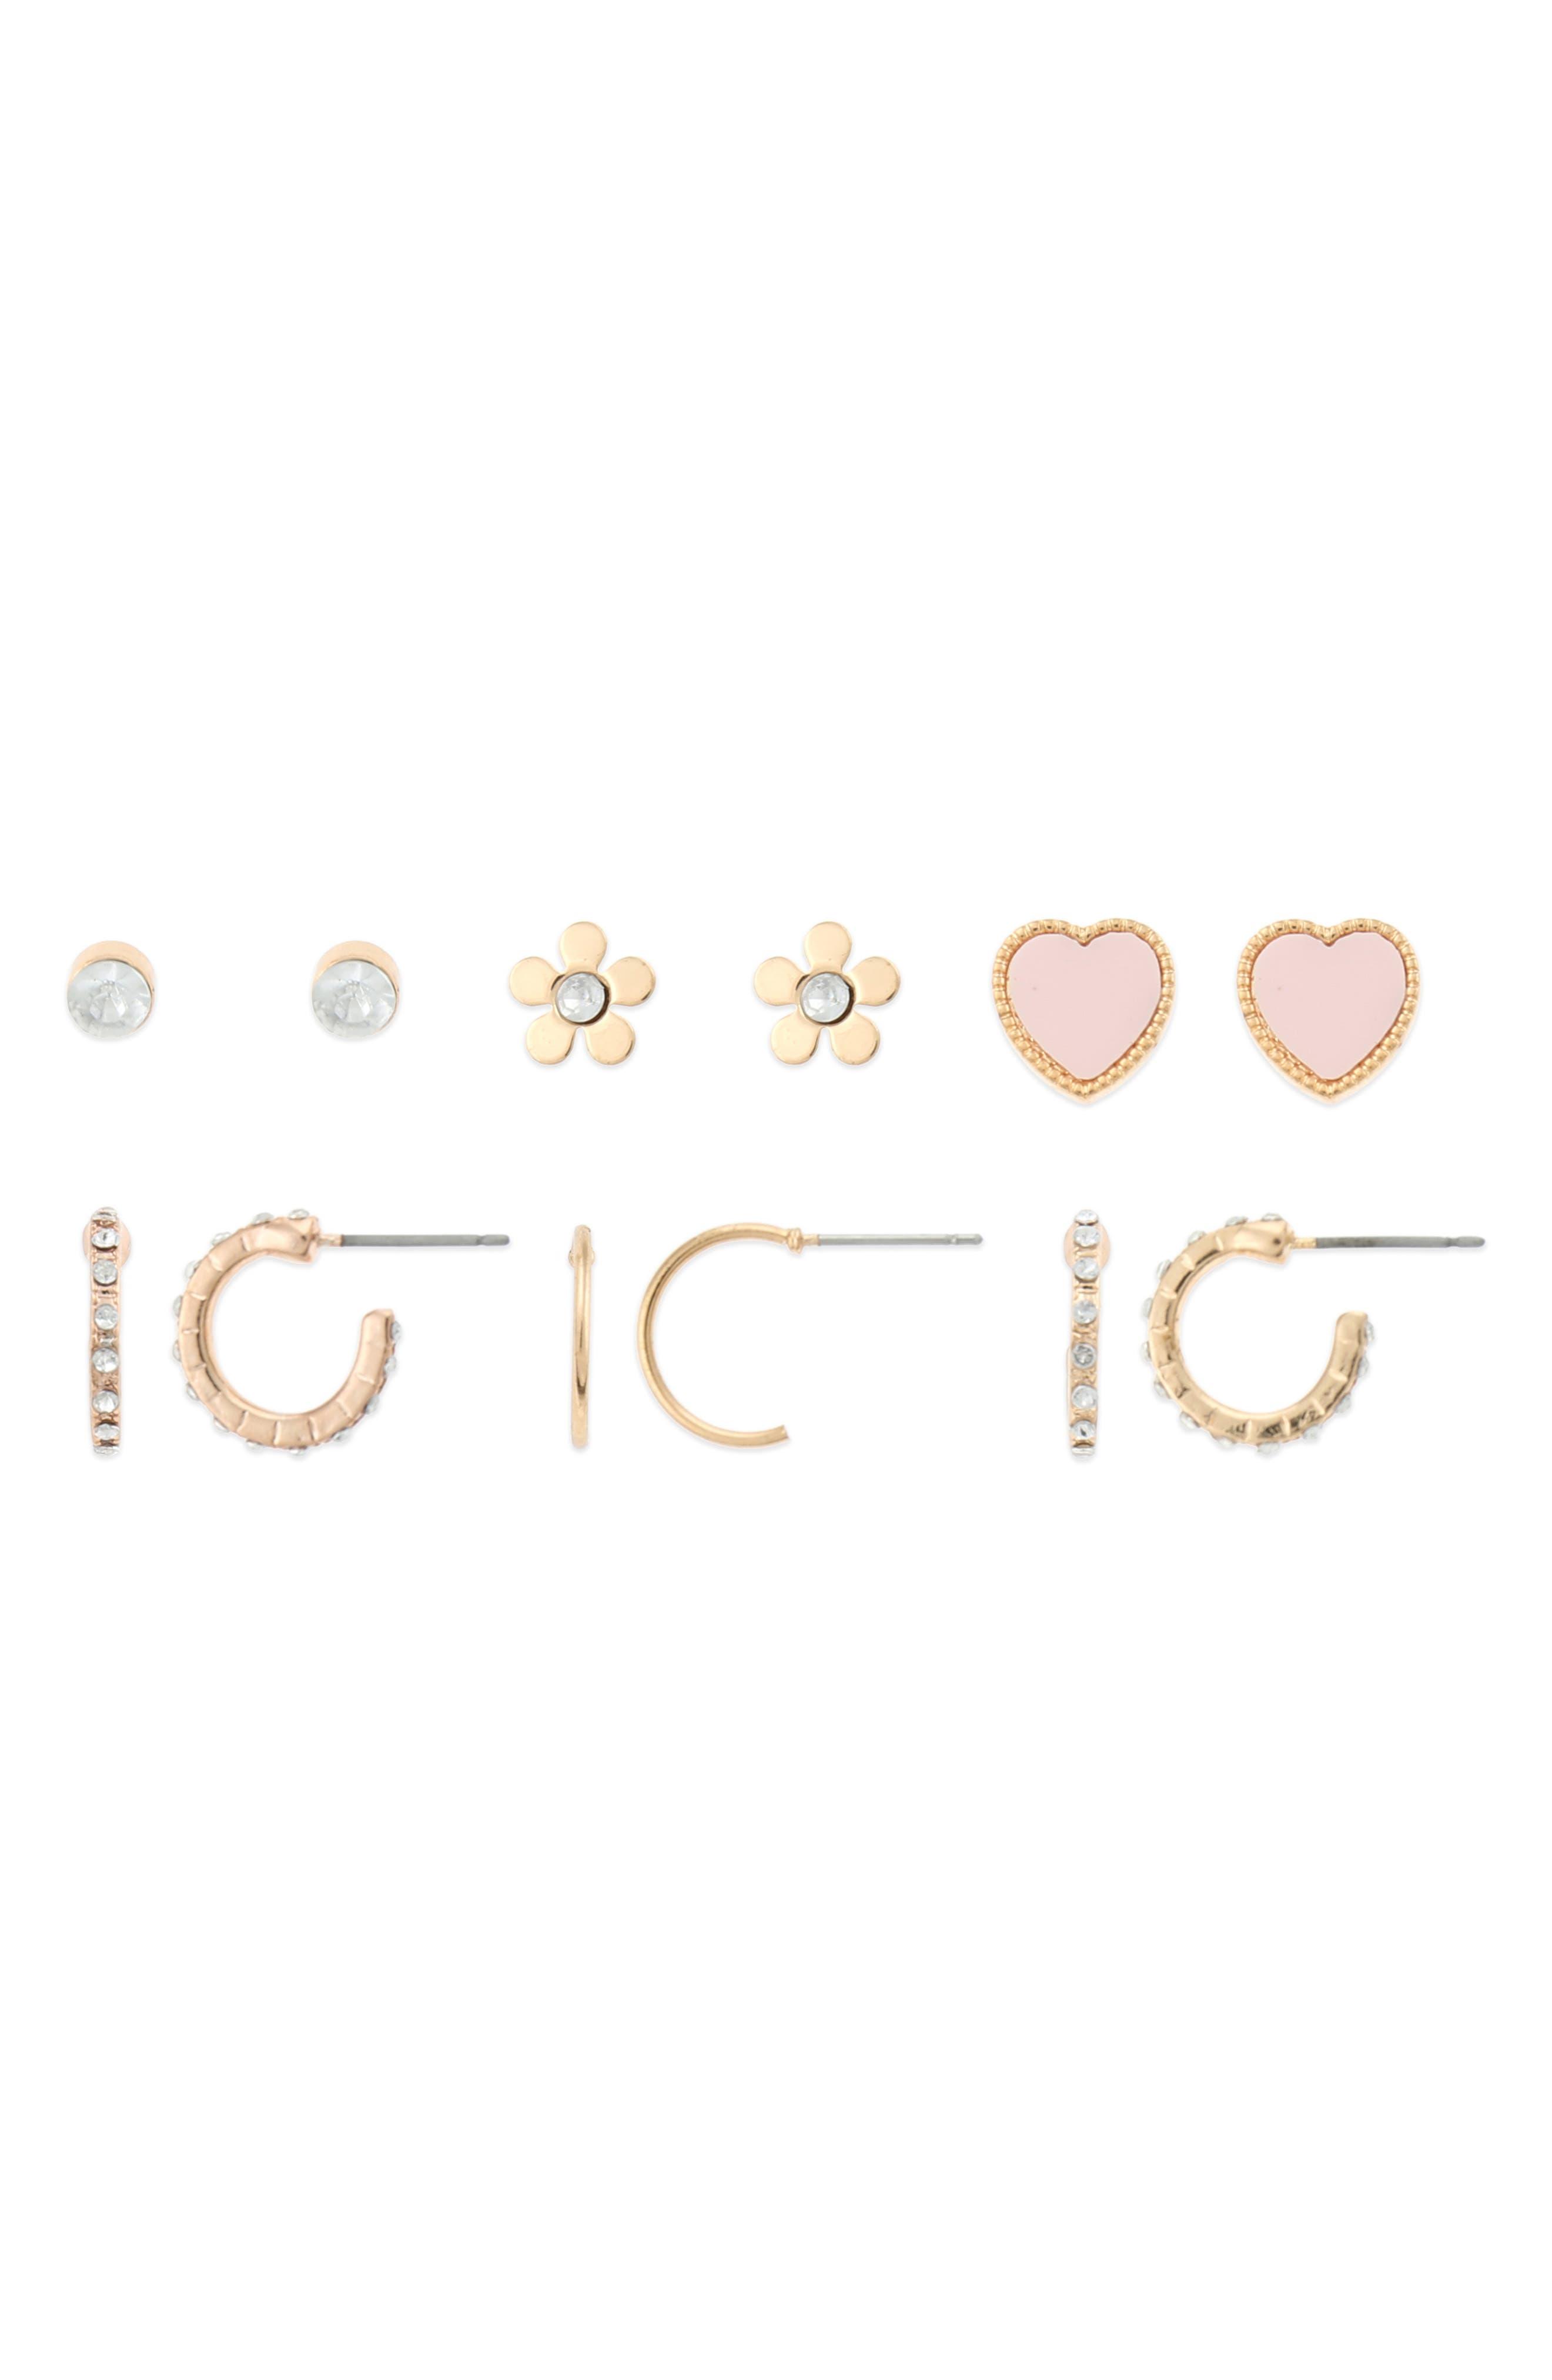 Girls Capelli New York I Will Shine 6Piece Earring Set